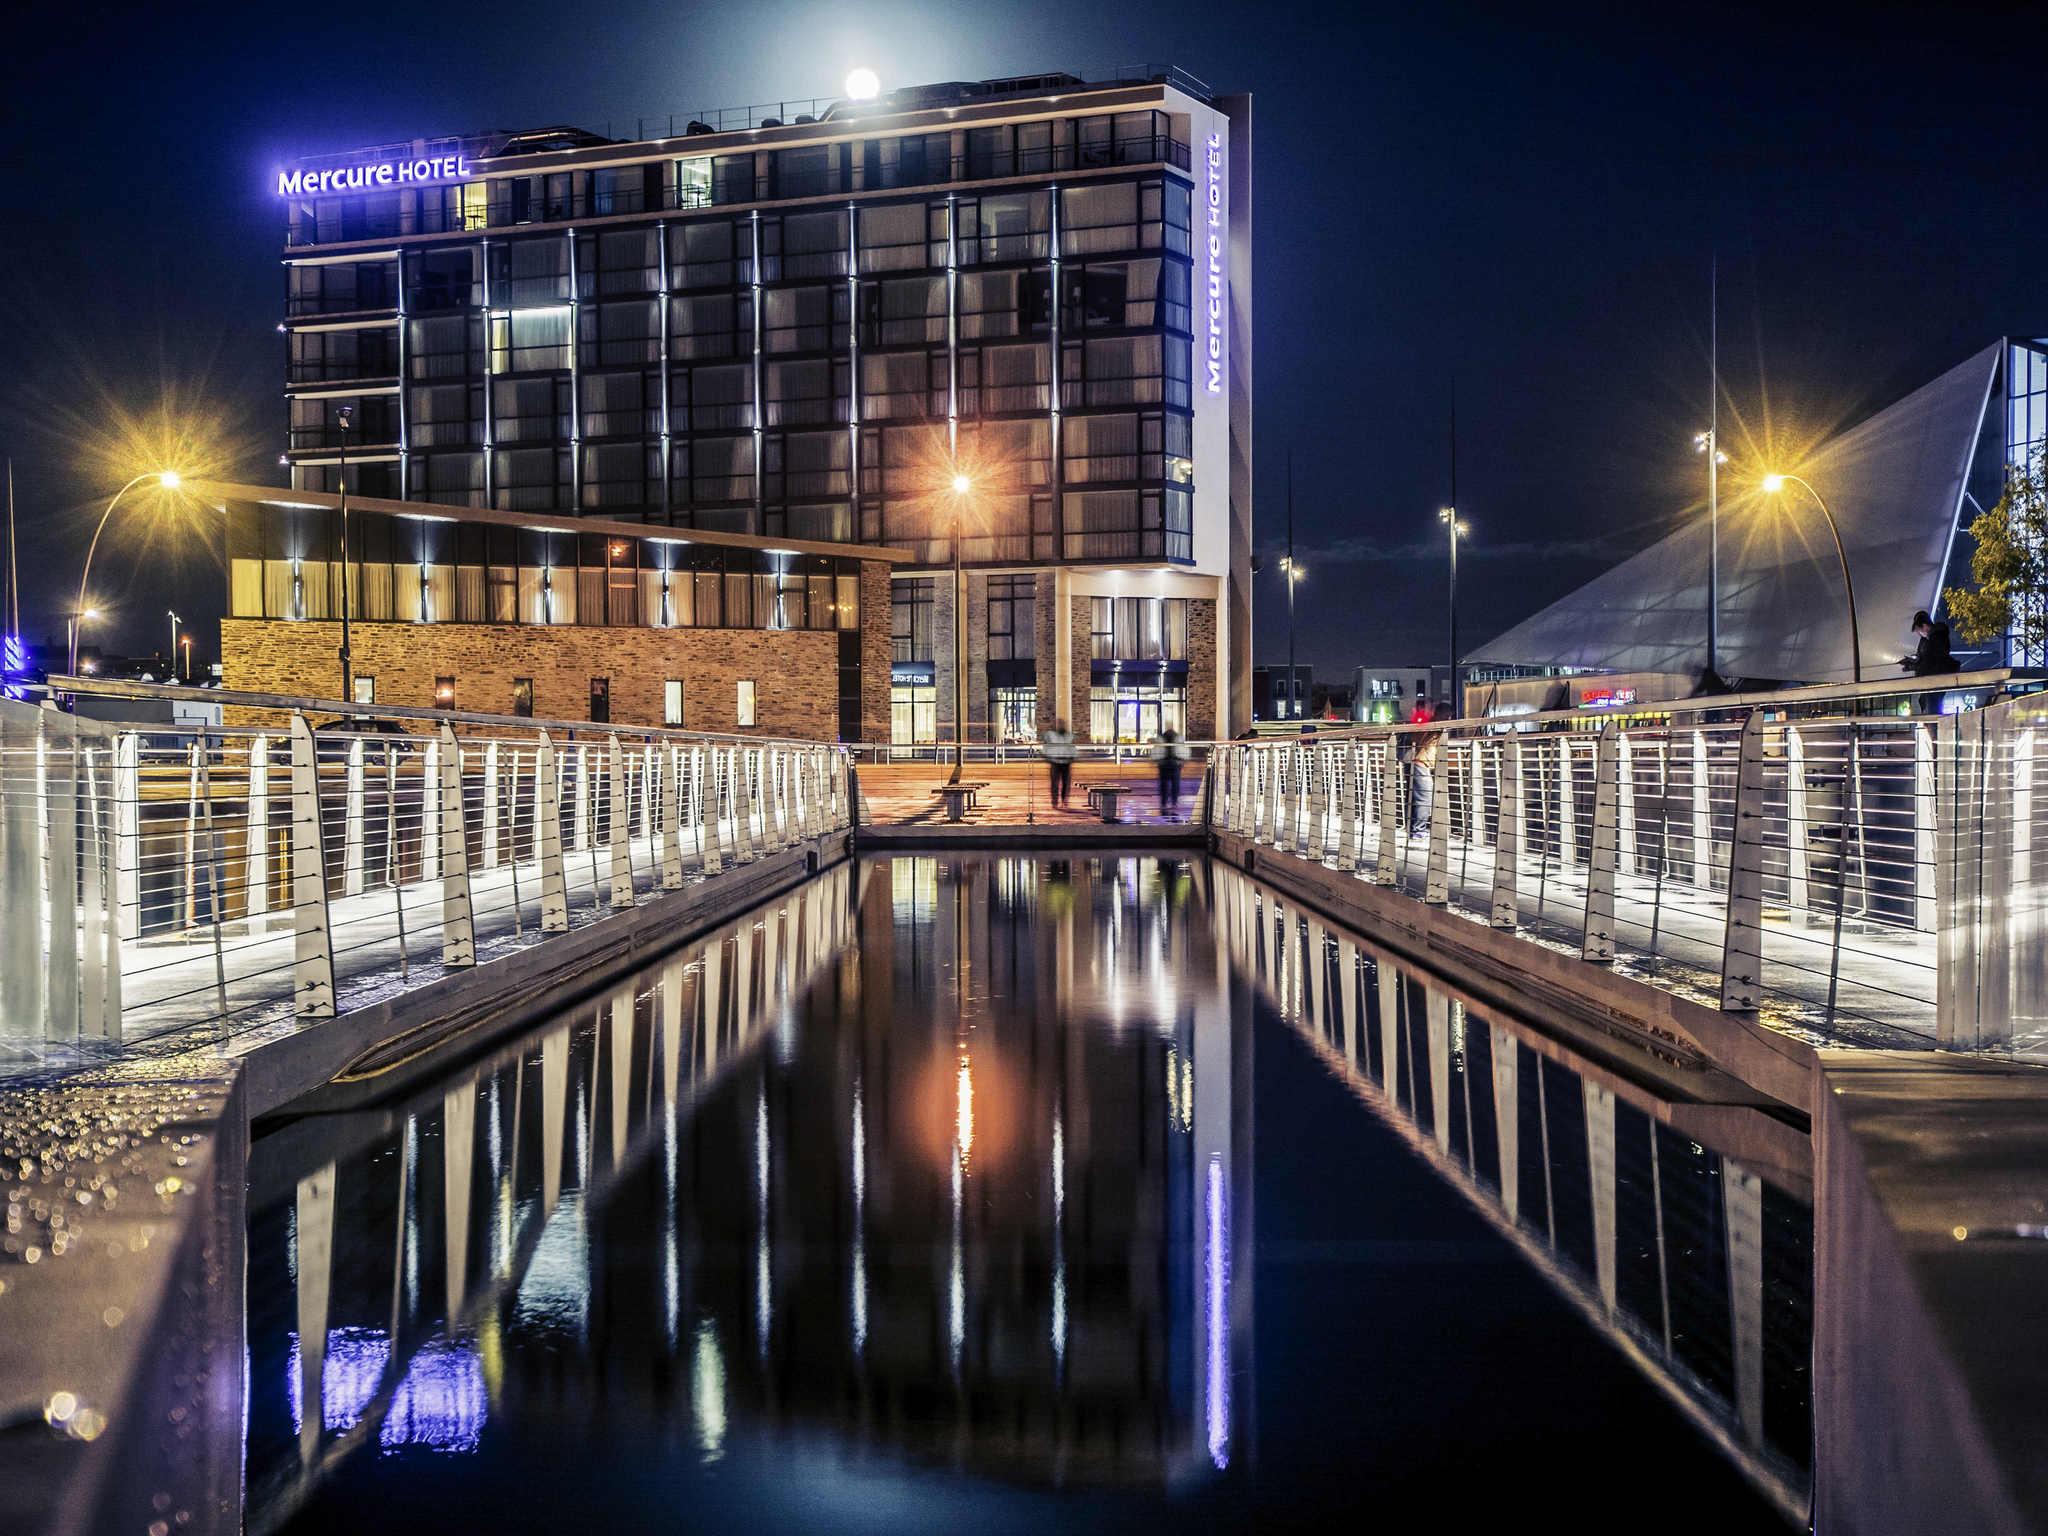 Hotel - Hotel Mercure Cherbourg Centre Port